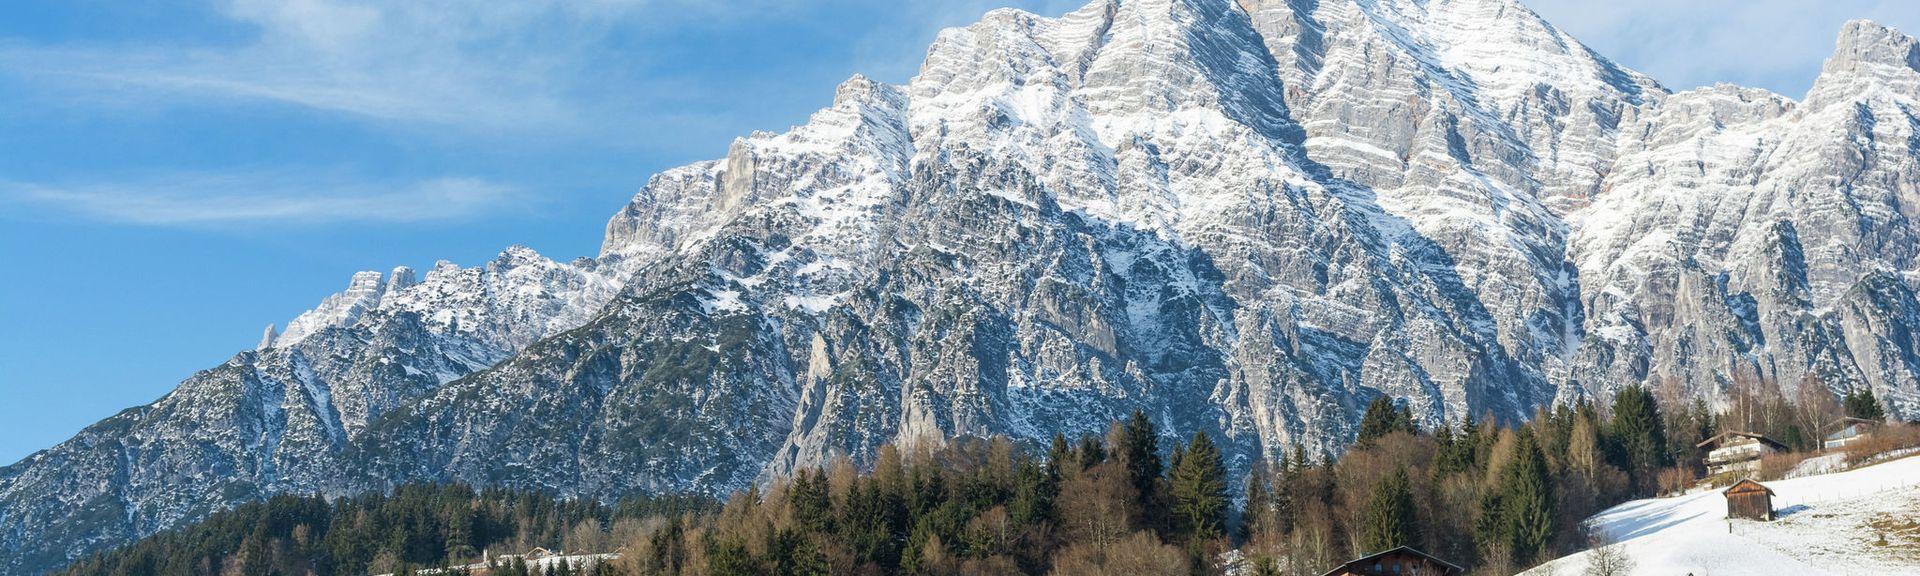 Salzburger Saalachtal, Austria